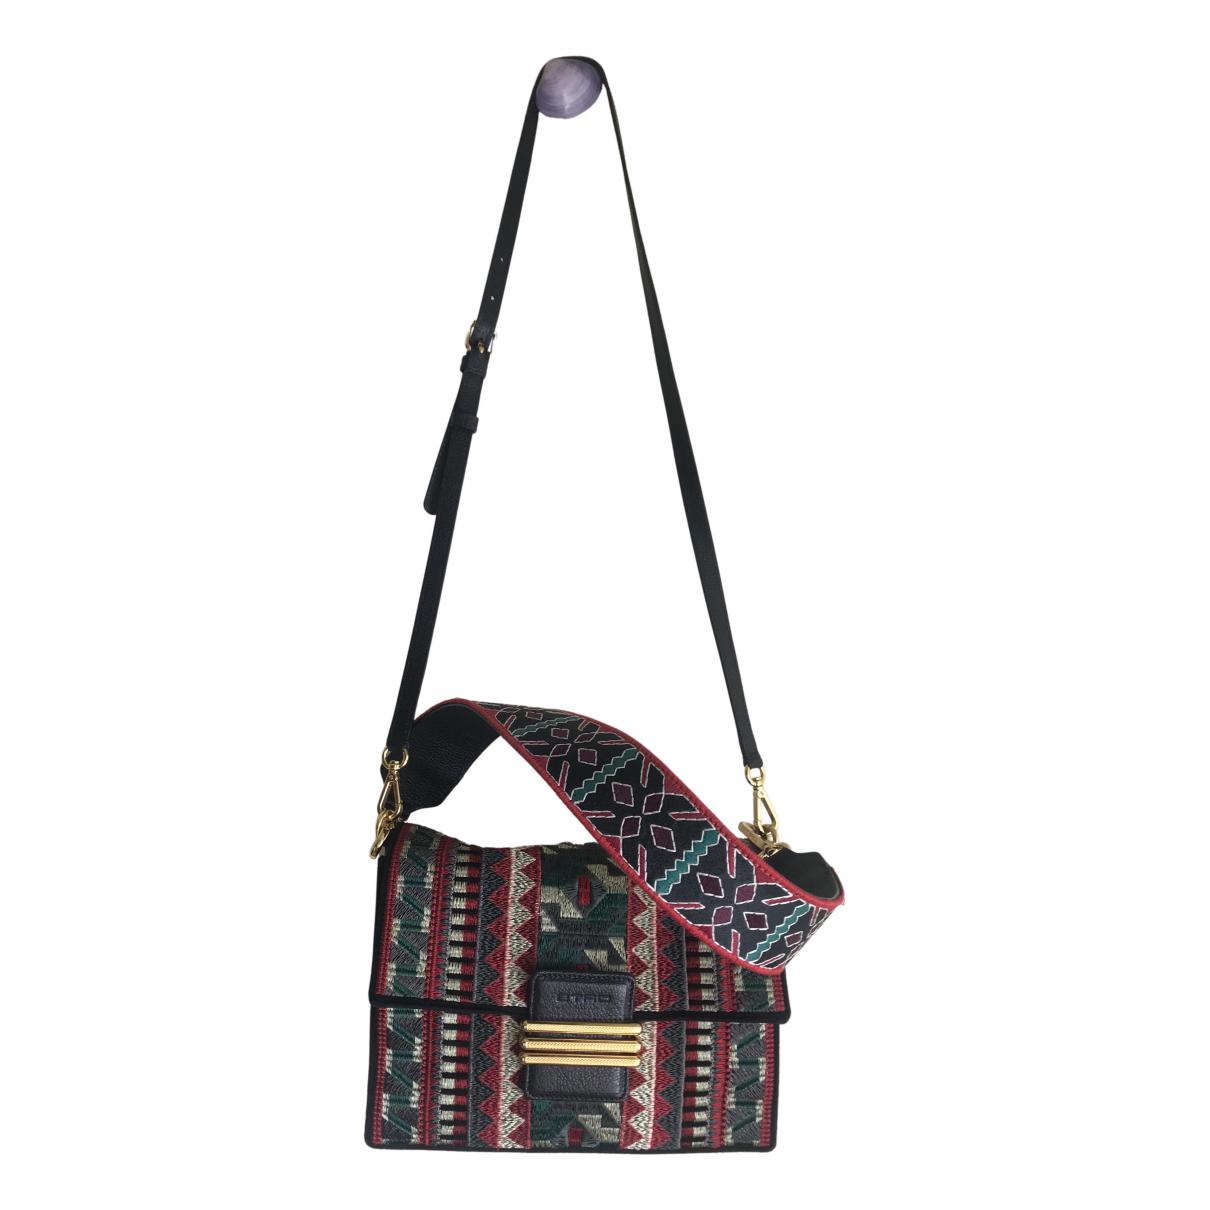 Etro N Multicolour Leather handbag for Women N